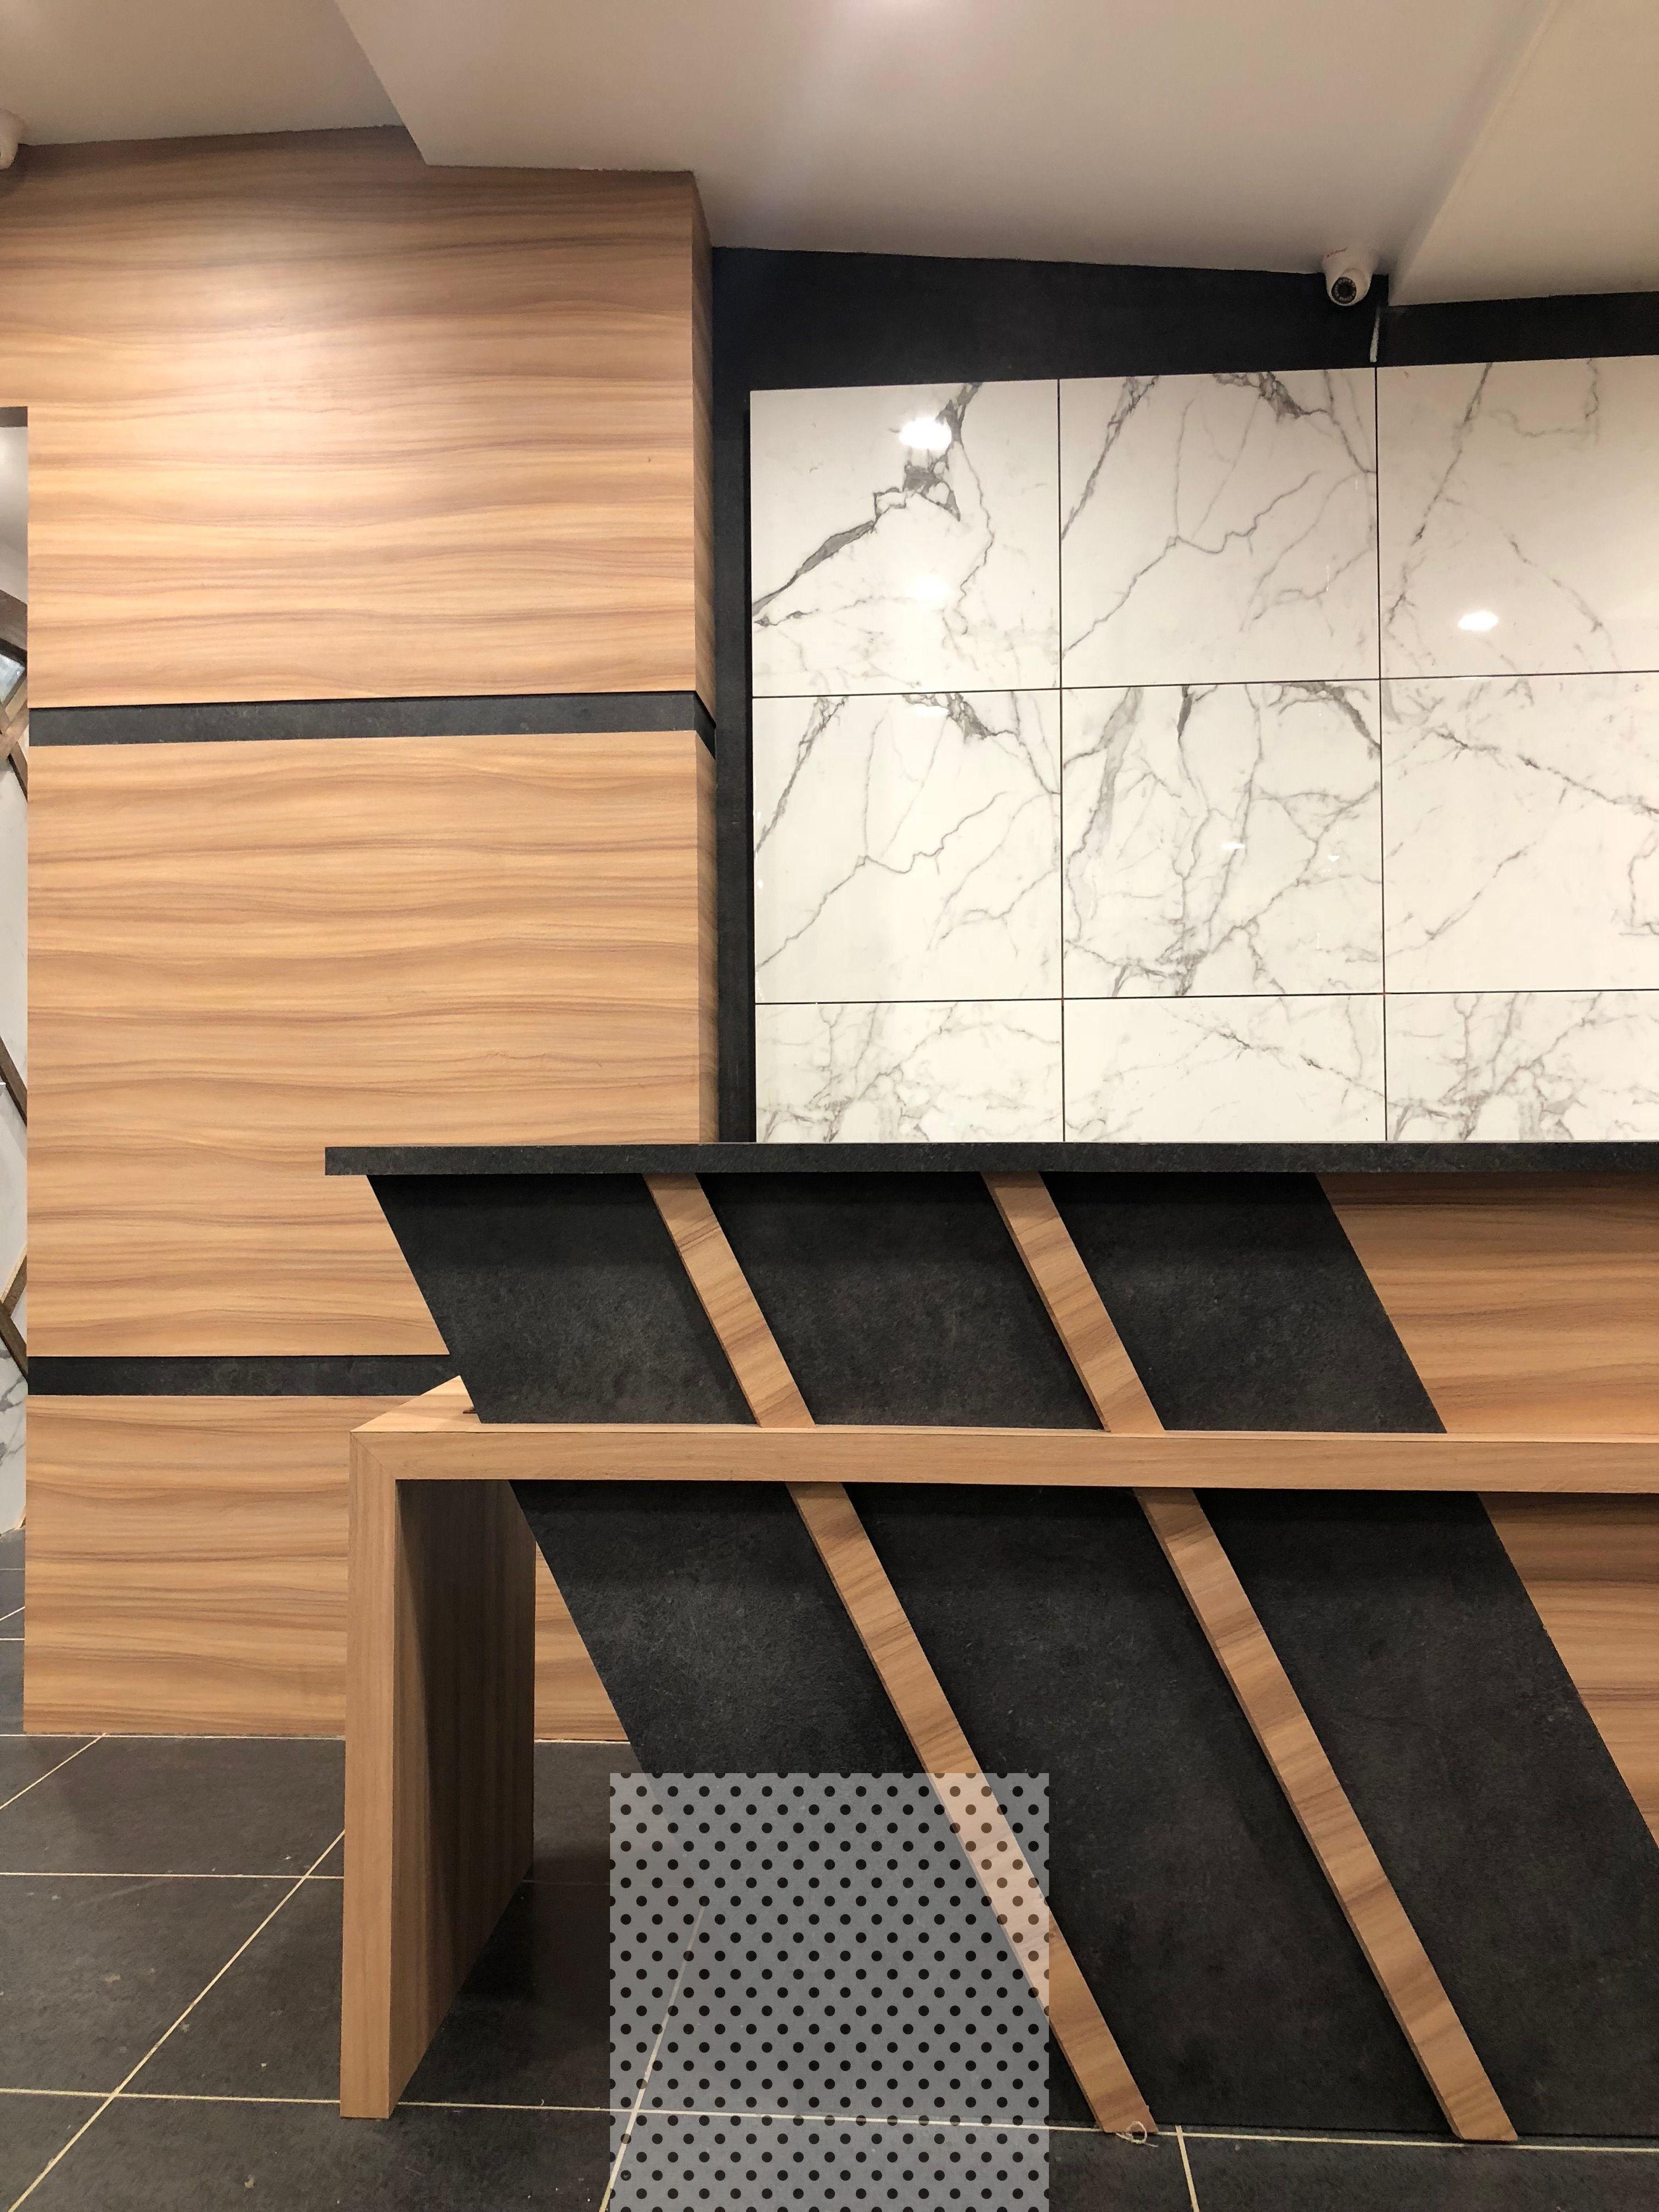 15 Impressive Farmhouse Contemporary Decor Ideas Office Reception Table Design Office Table Design Reception Table Design